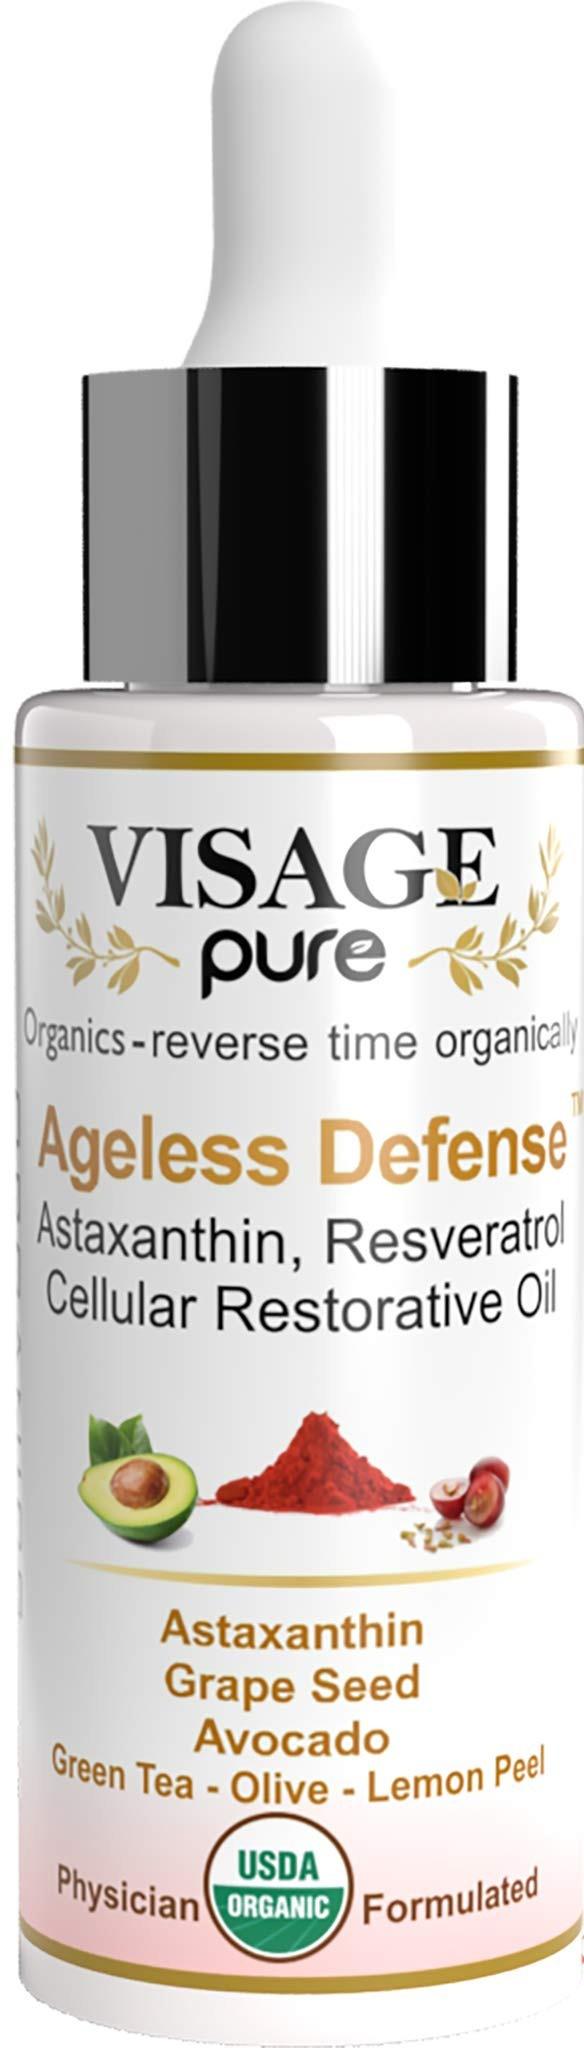 Visage Pure Ageless Defense